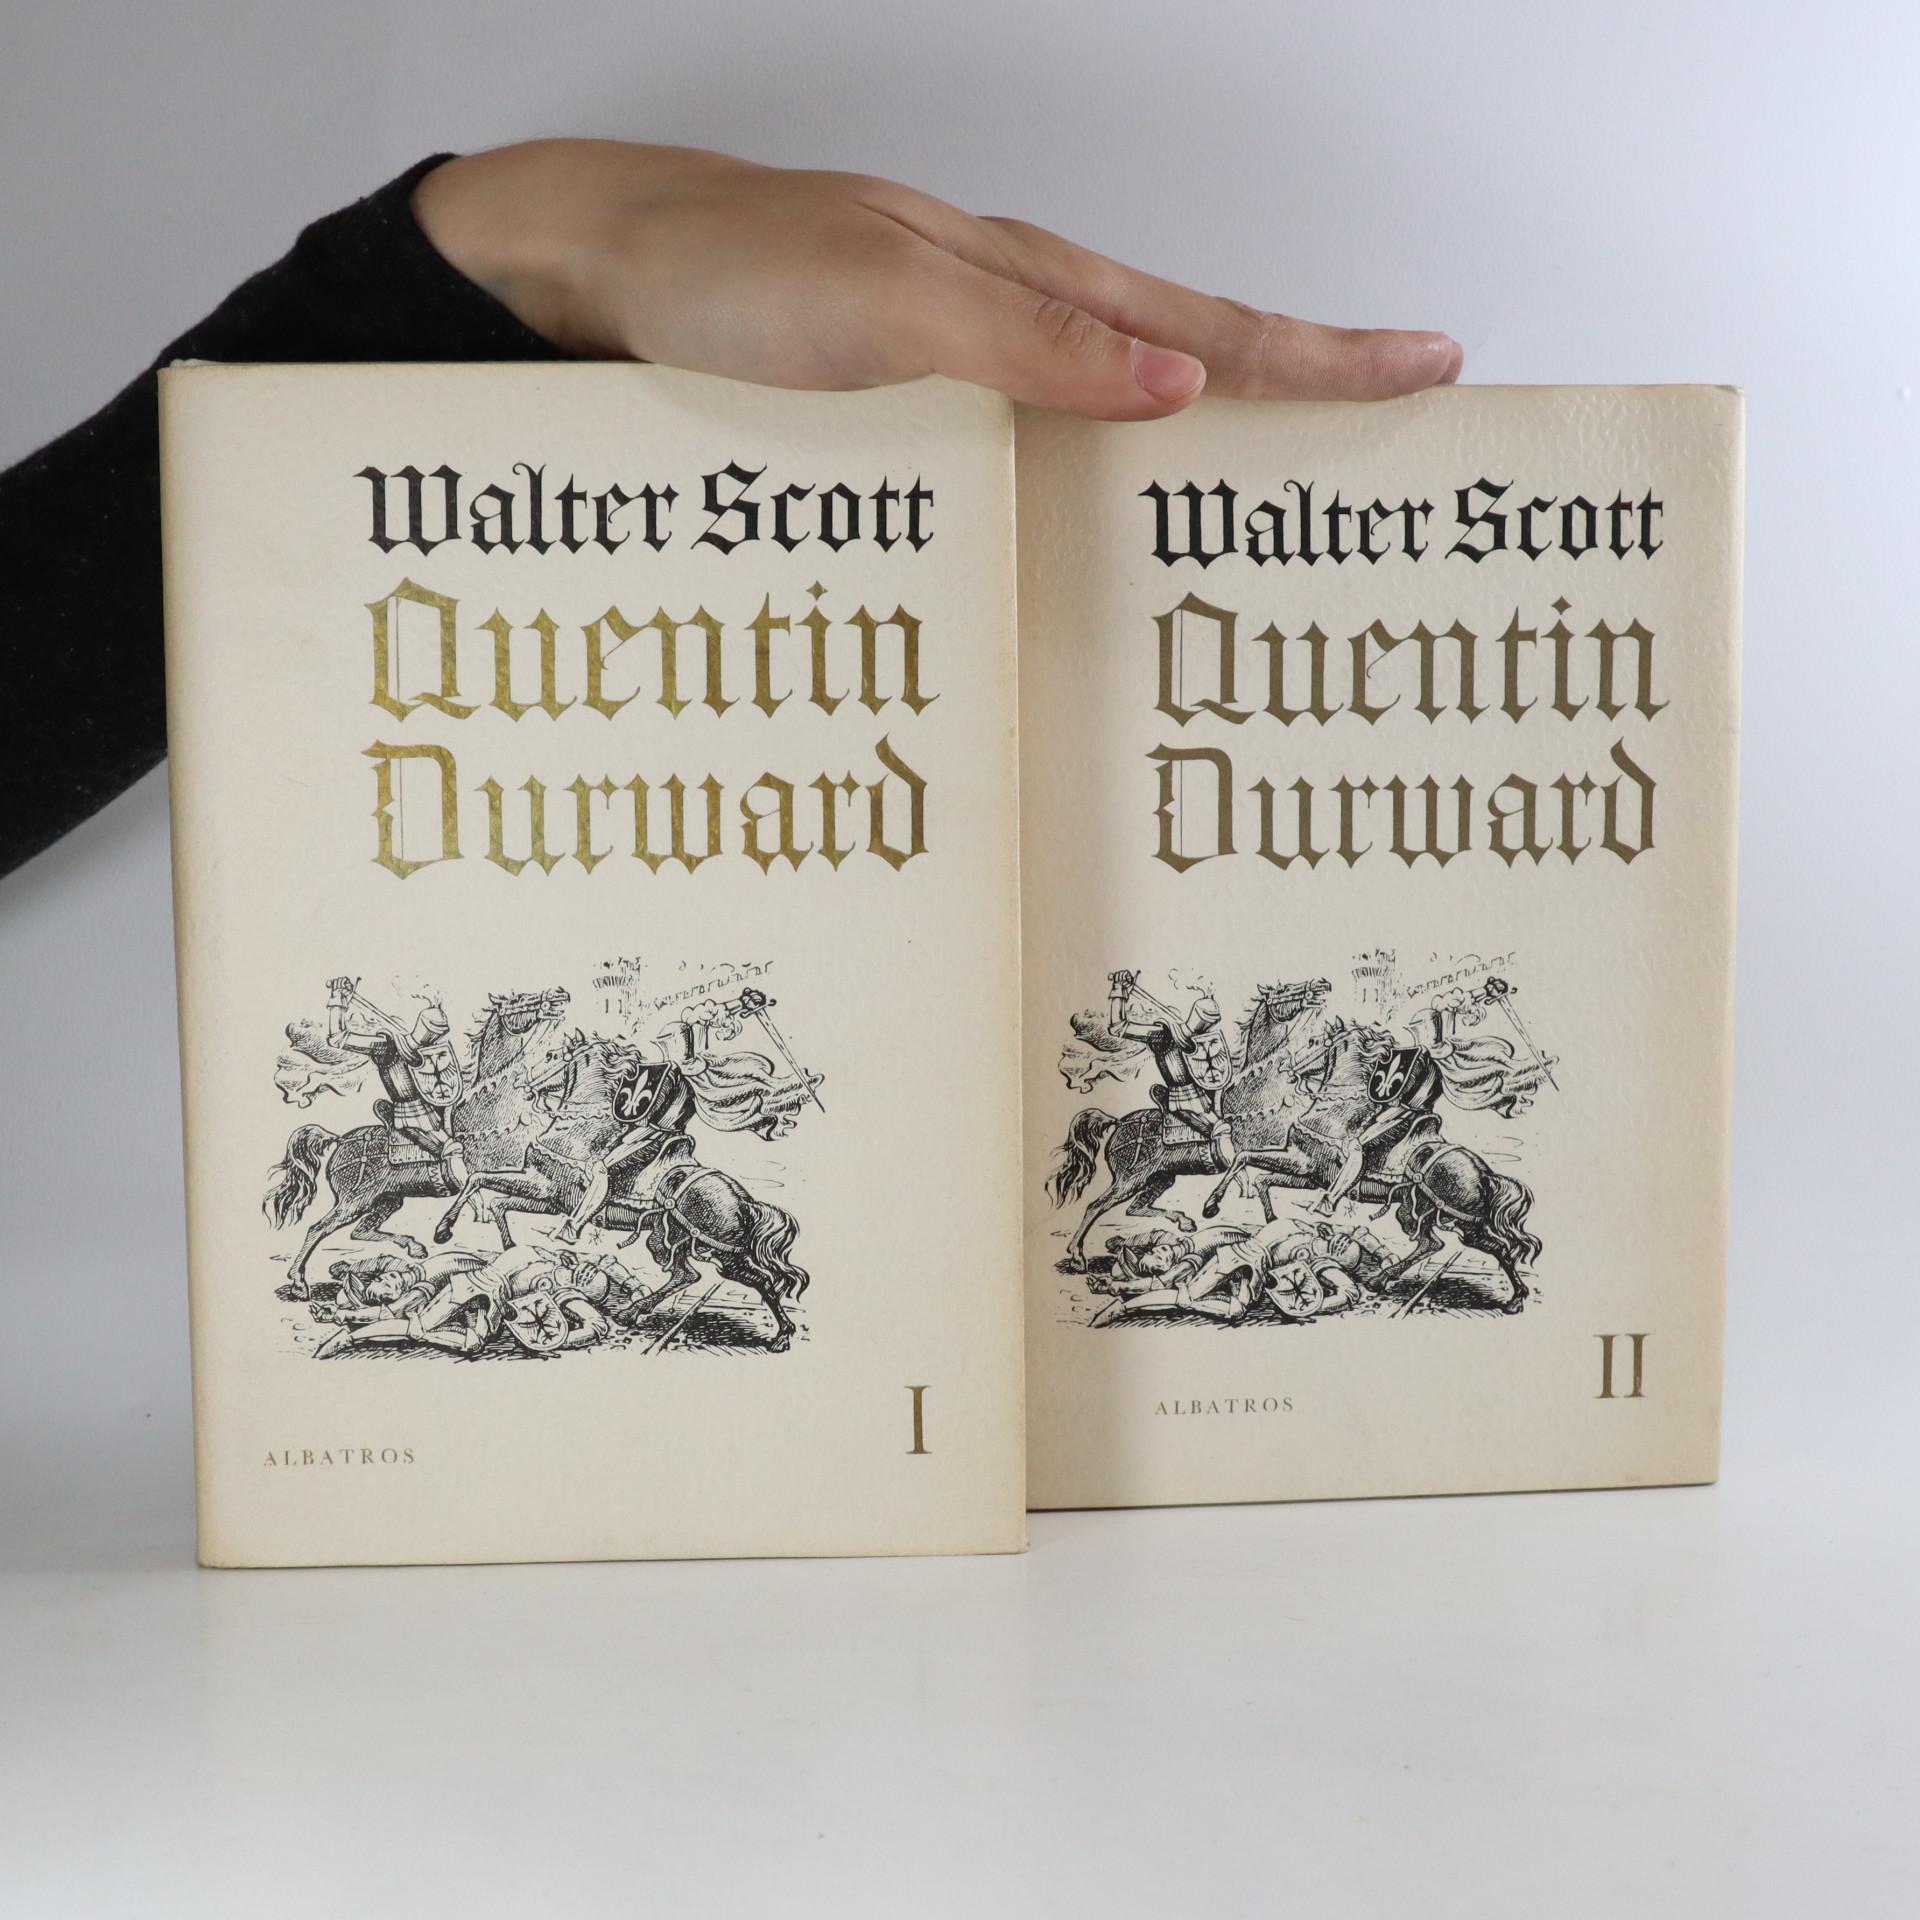 antikvární kniha Quentin Durward I. a II. díl (2 svazky), 1971